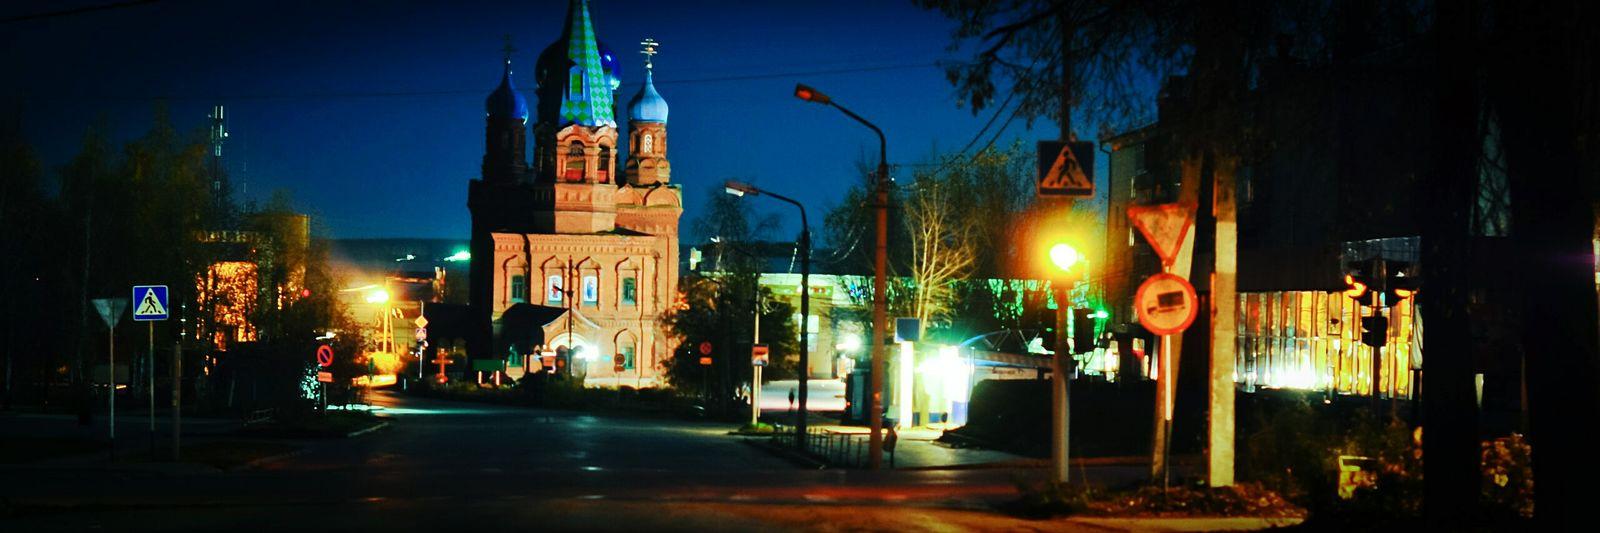 Cityscapes Streetphoto Summer Krasnoyfimsk Ural My City City Lights Hello World